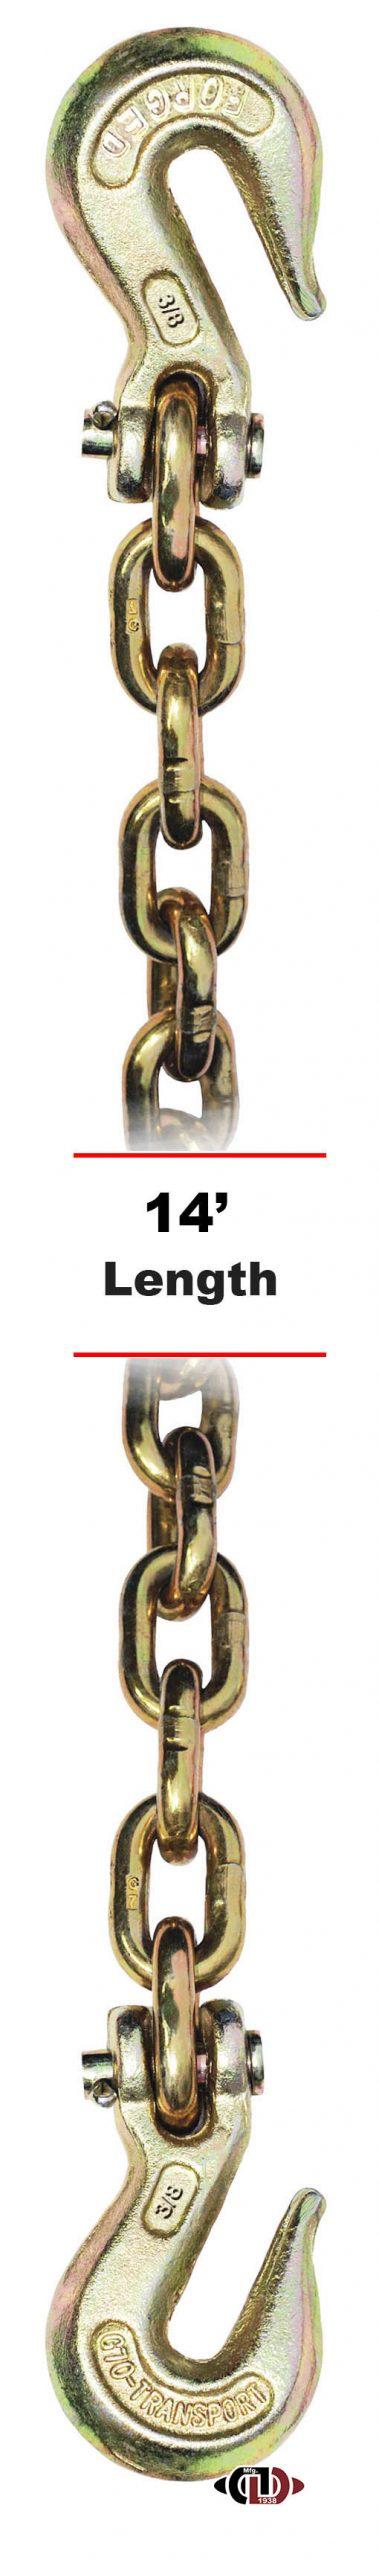 "G-70 3/8"" x 14' Chain w/ Clevis Grab Hooks on Both Ends DBC-38x14-G7-CGH"